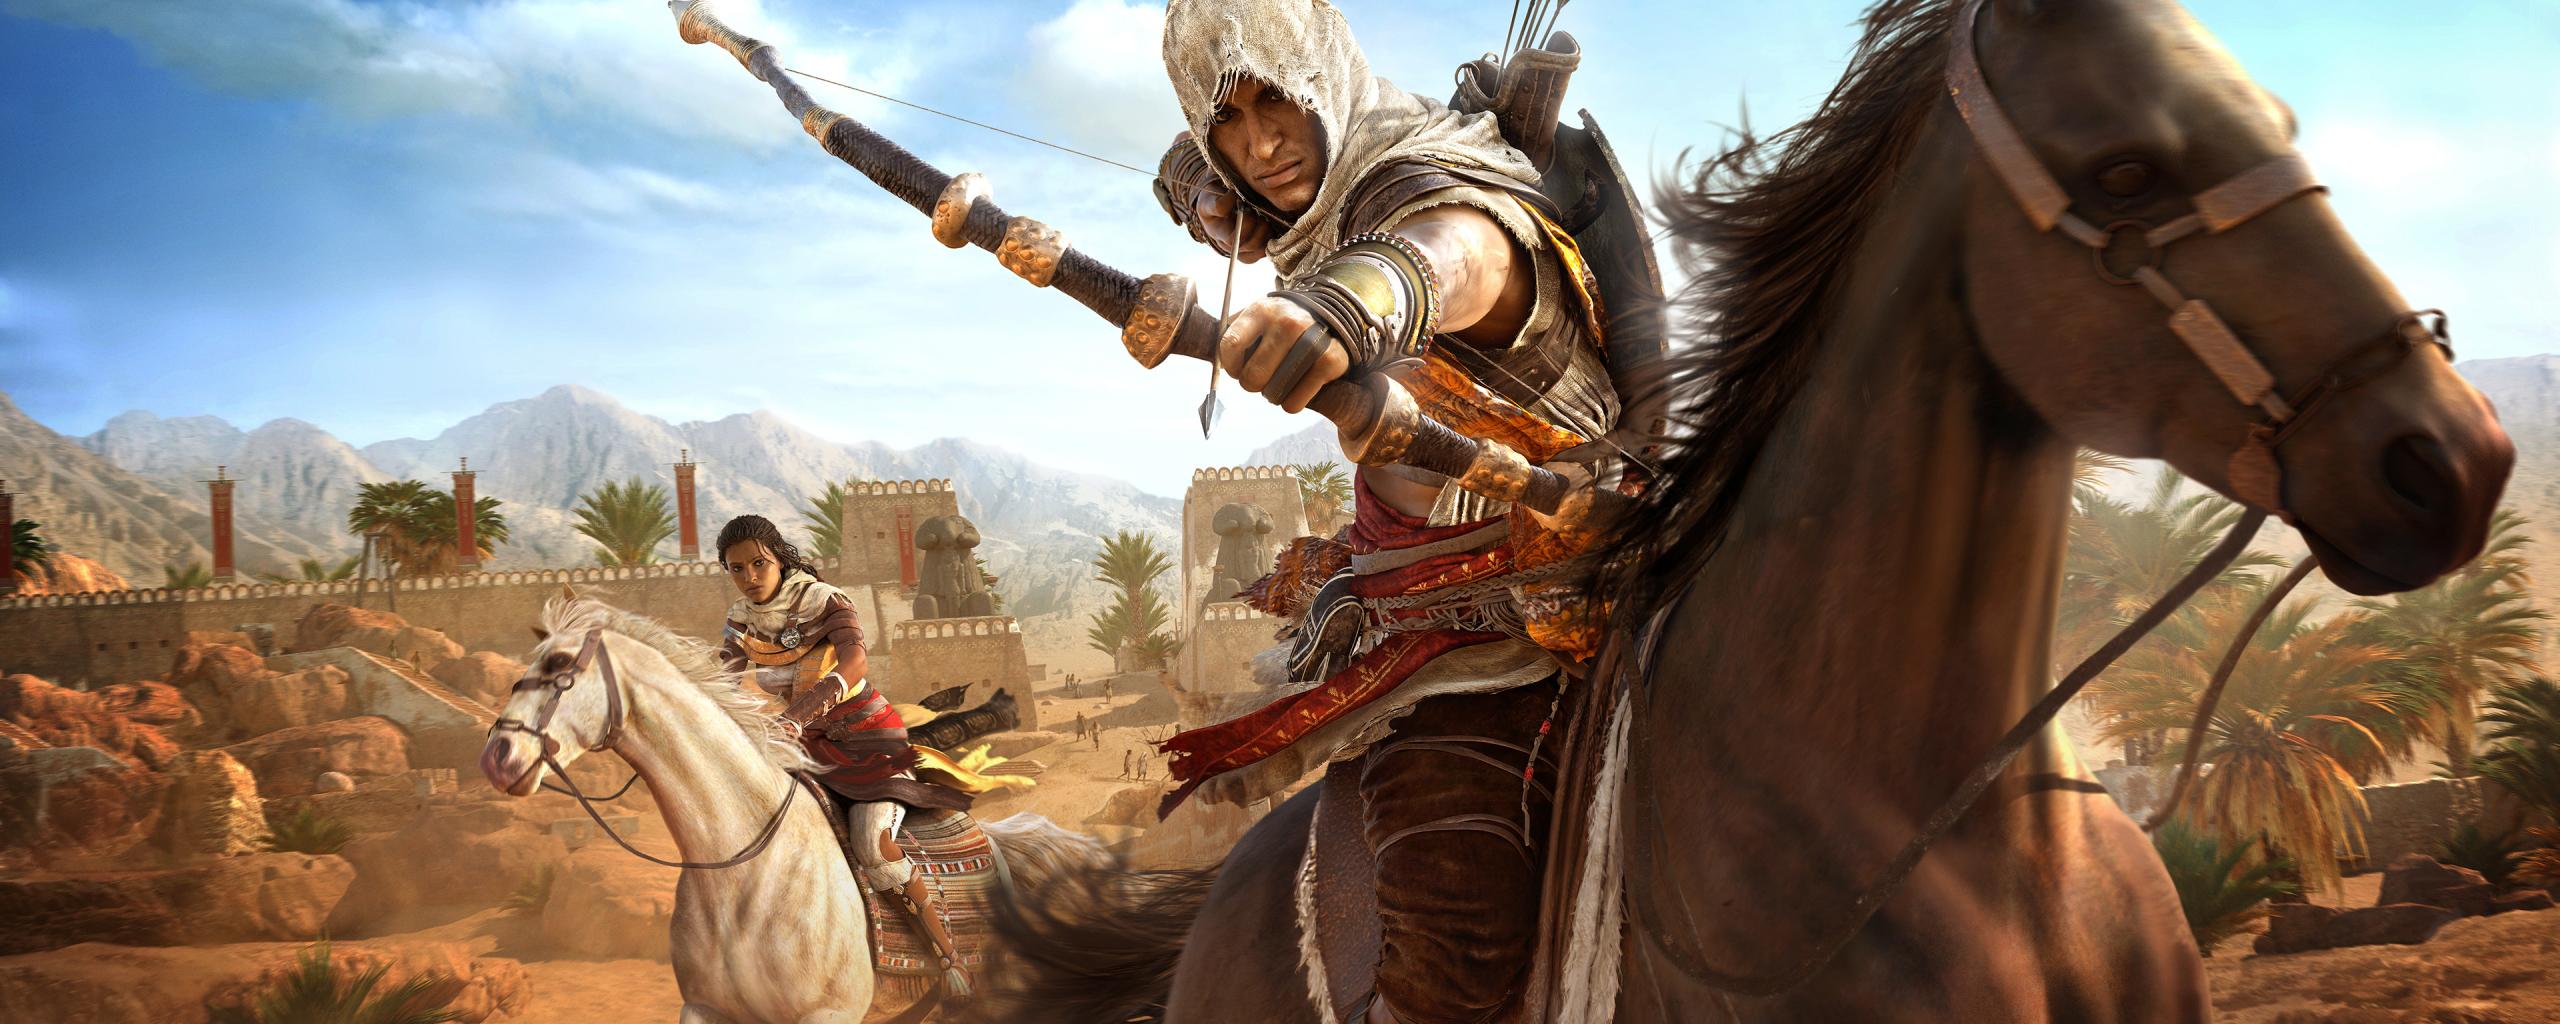 Assassins Creed Origins Bayek And Aya, HD 4K Wallpaper